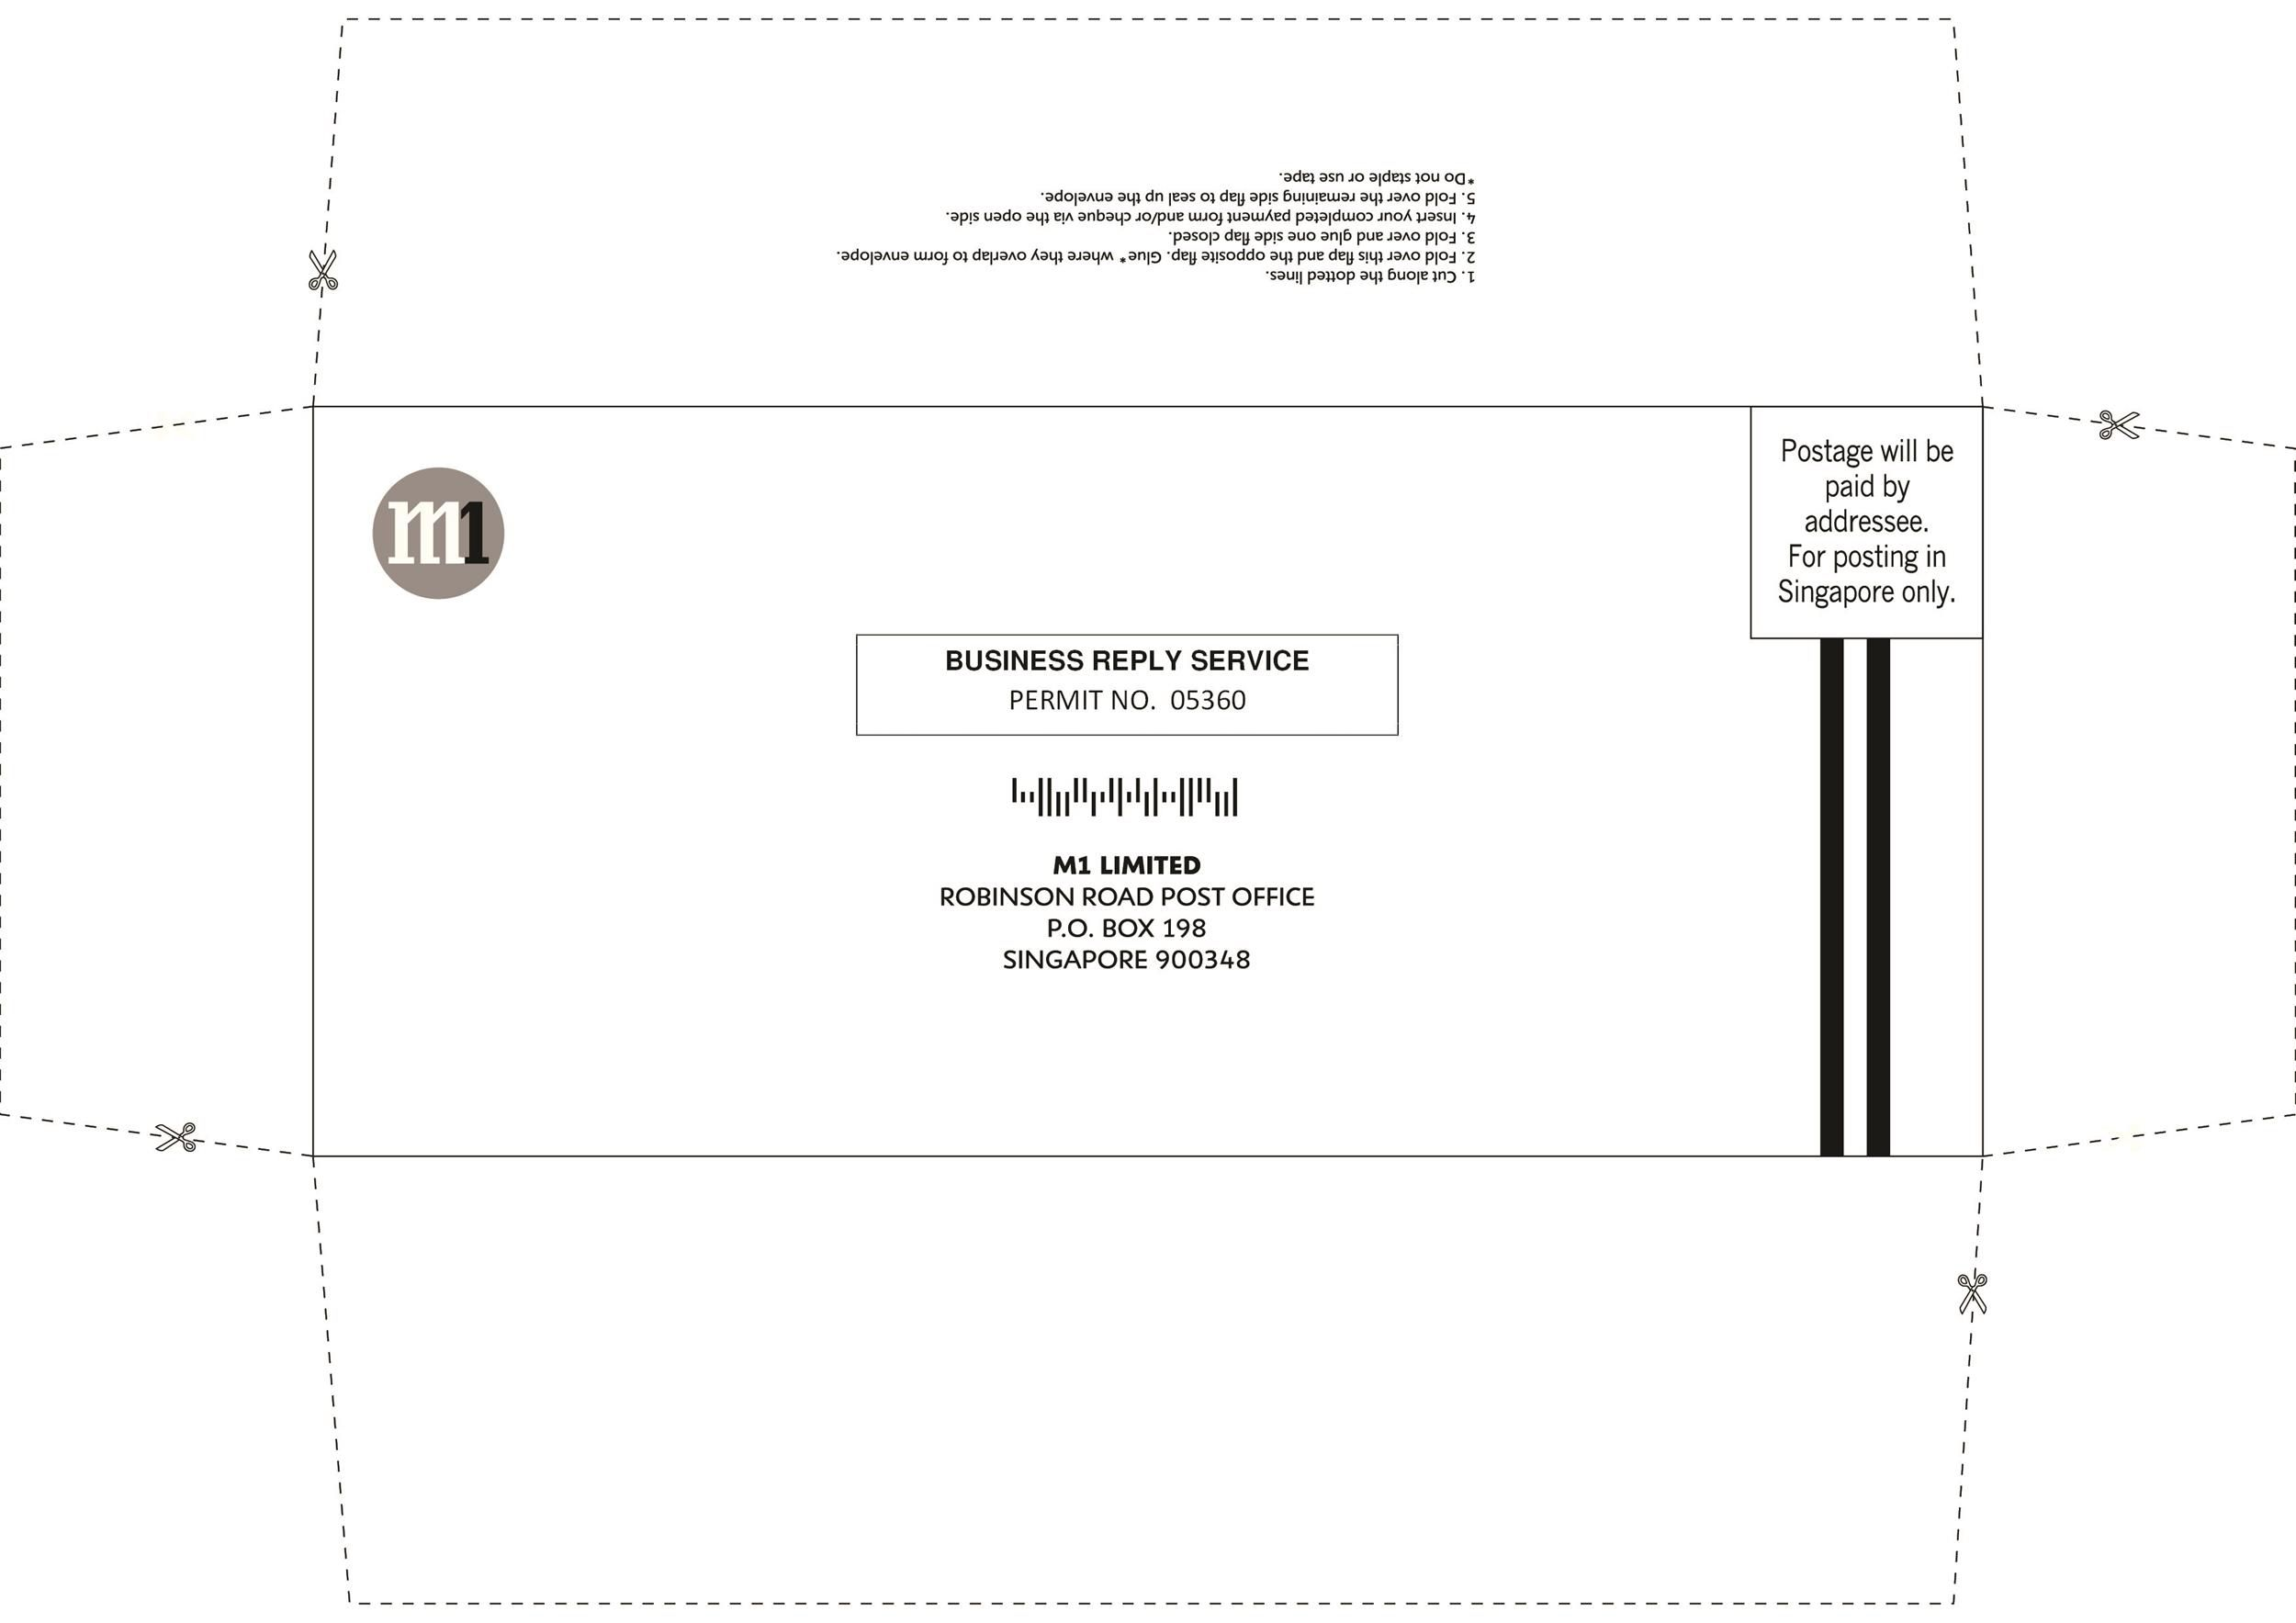 004 Rare 10 Envelope Template Word Photo  Size Microsoft #10 Double WindowFull